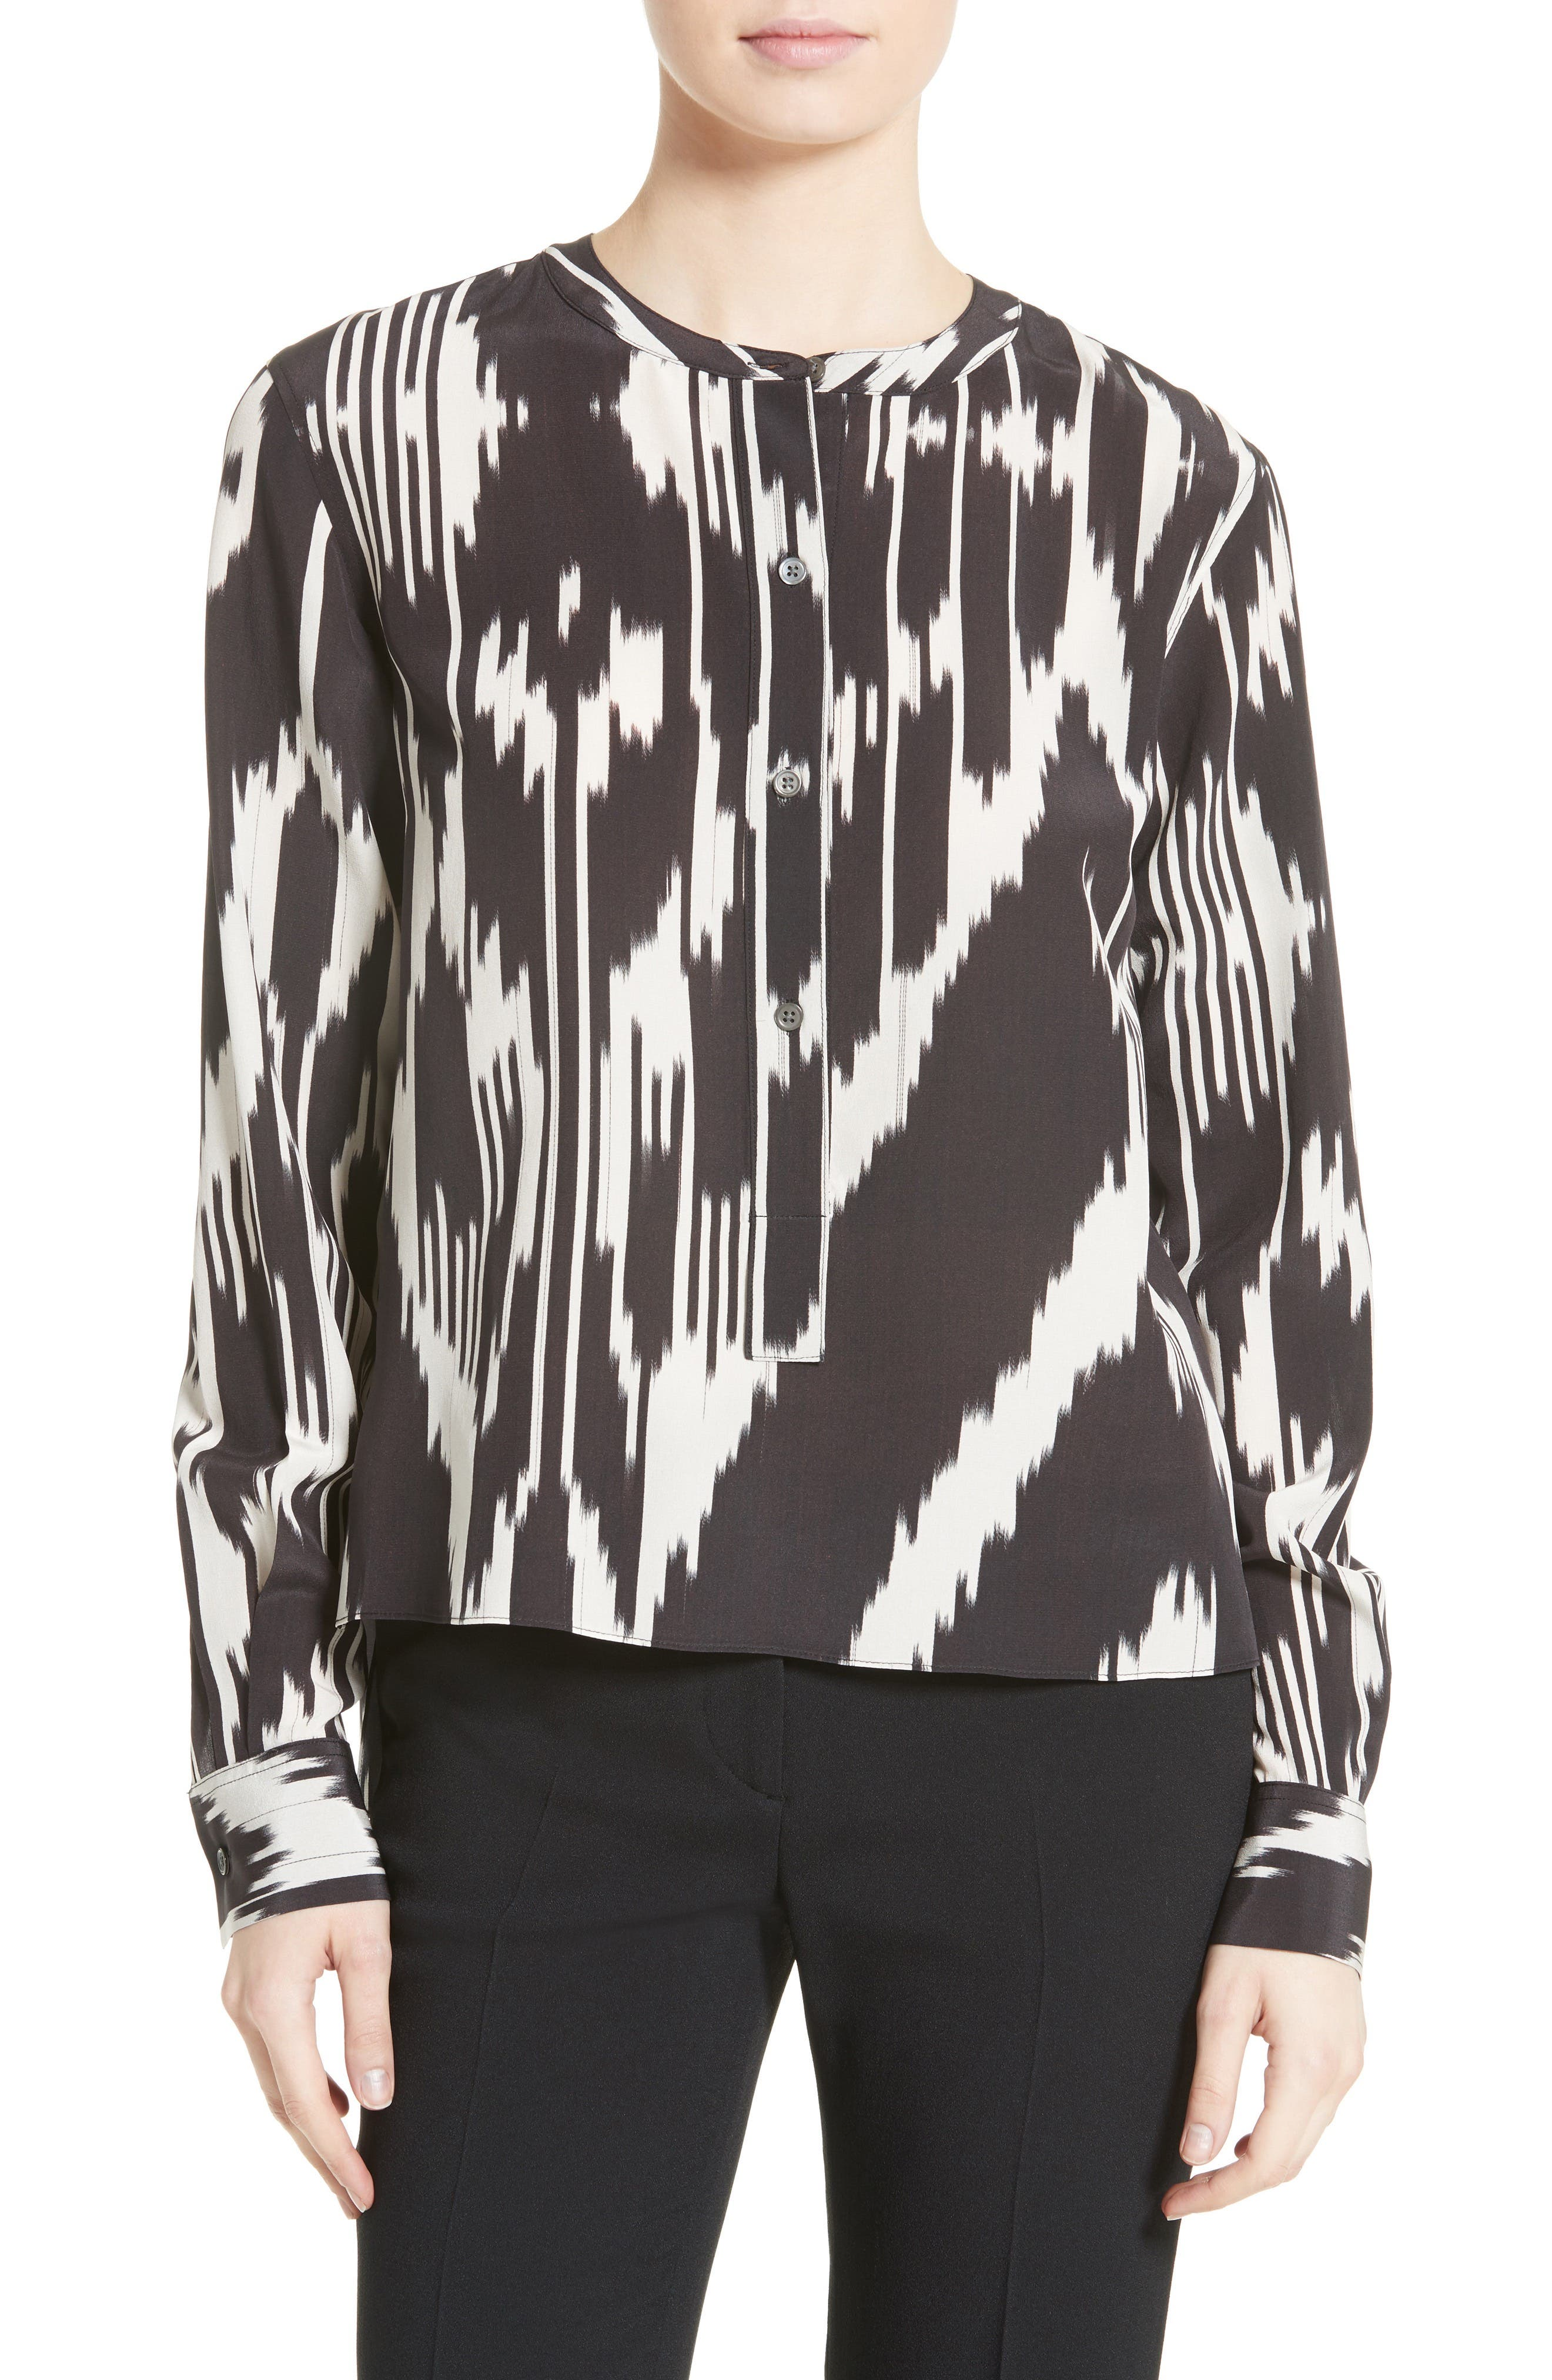 Isalva Interlace Ikat Silk Top,                         Main,                         color, Multi